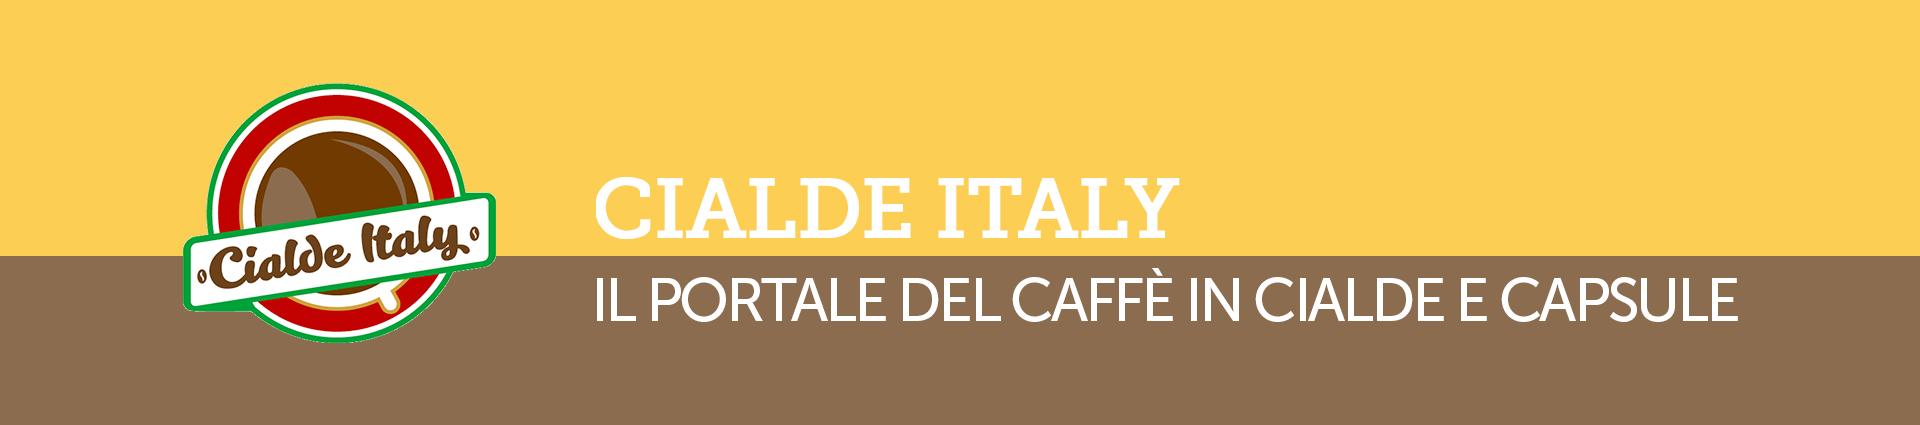 Cialde Italy Chi Siamo_Header